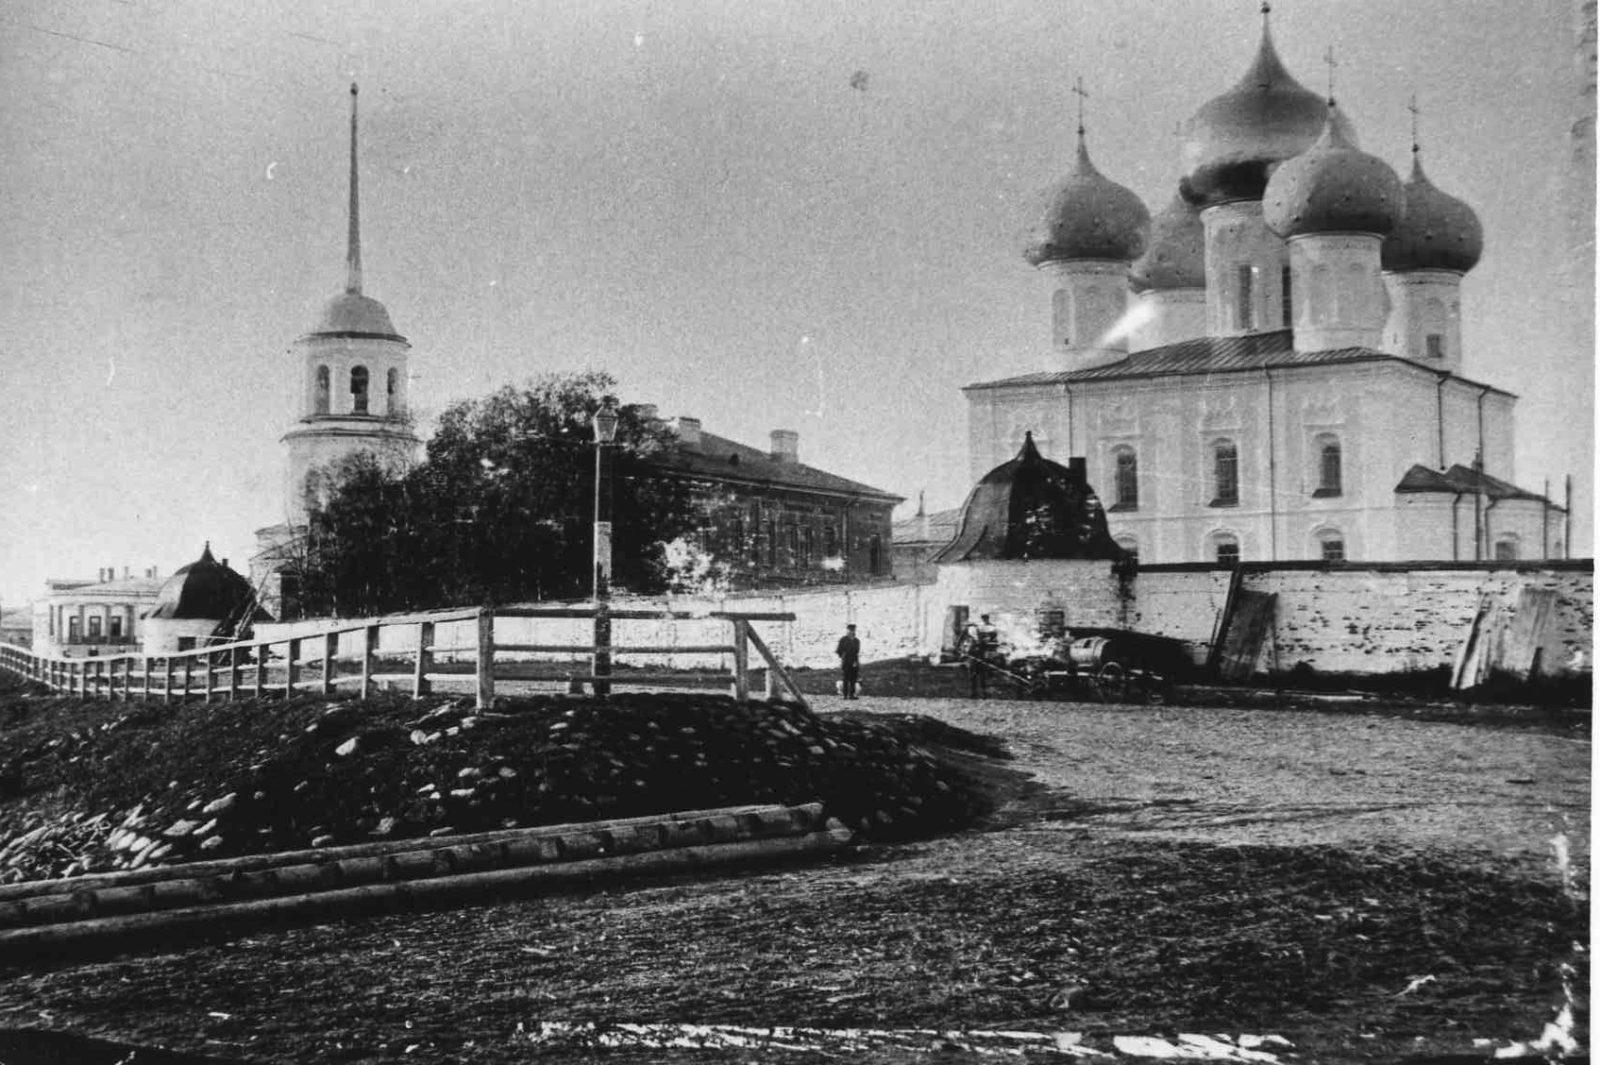 Mikhail-Archangel monastery. Arkhangelsk (Archangel) - Arkhangelsk (Archangel)